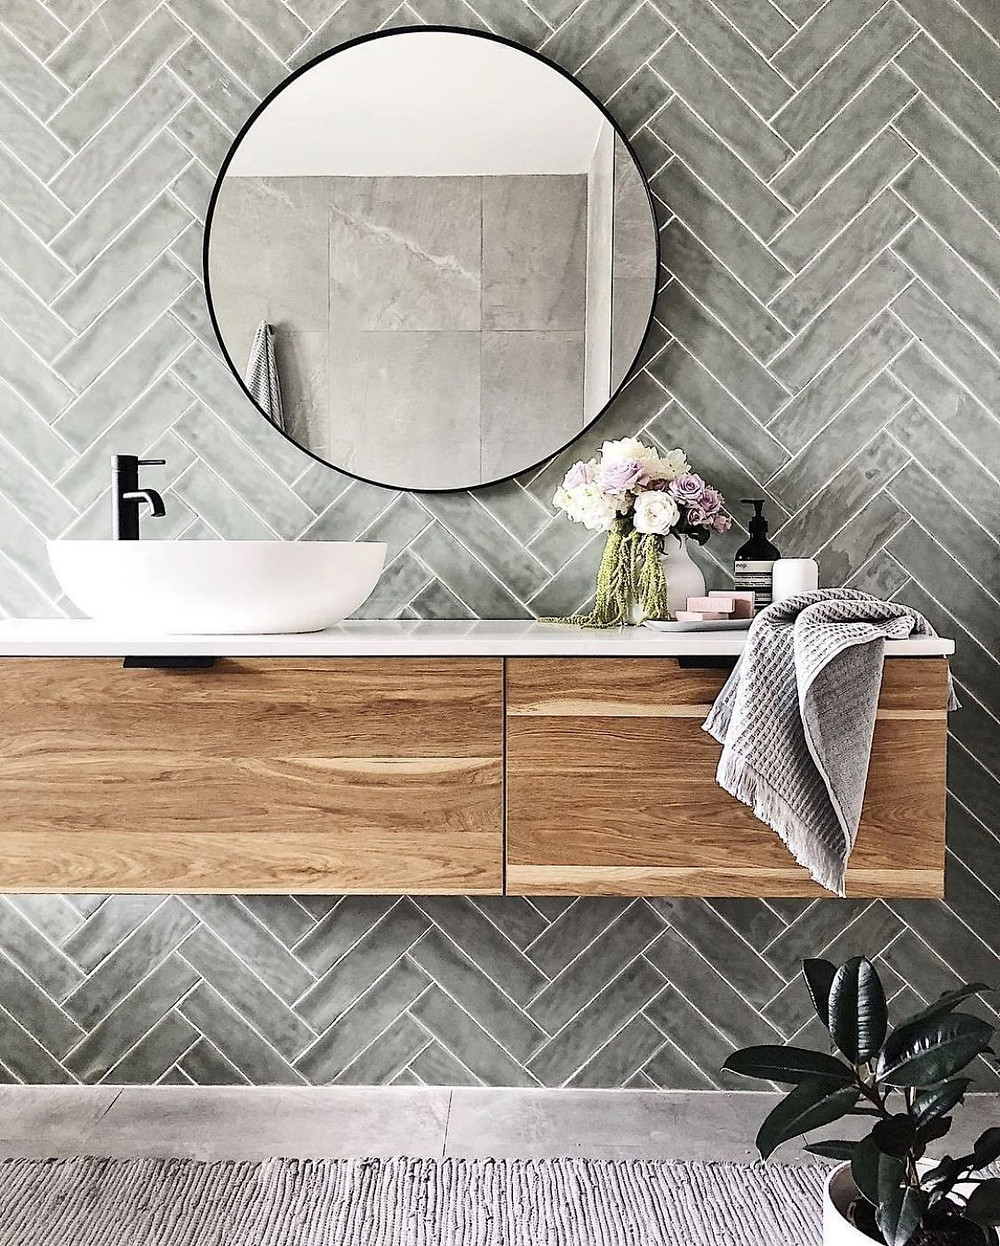 thin frame mirror. cluster free bathroom design tips. lakkad works